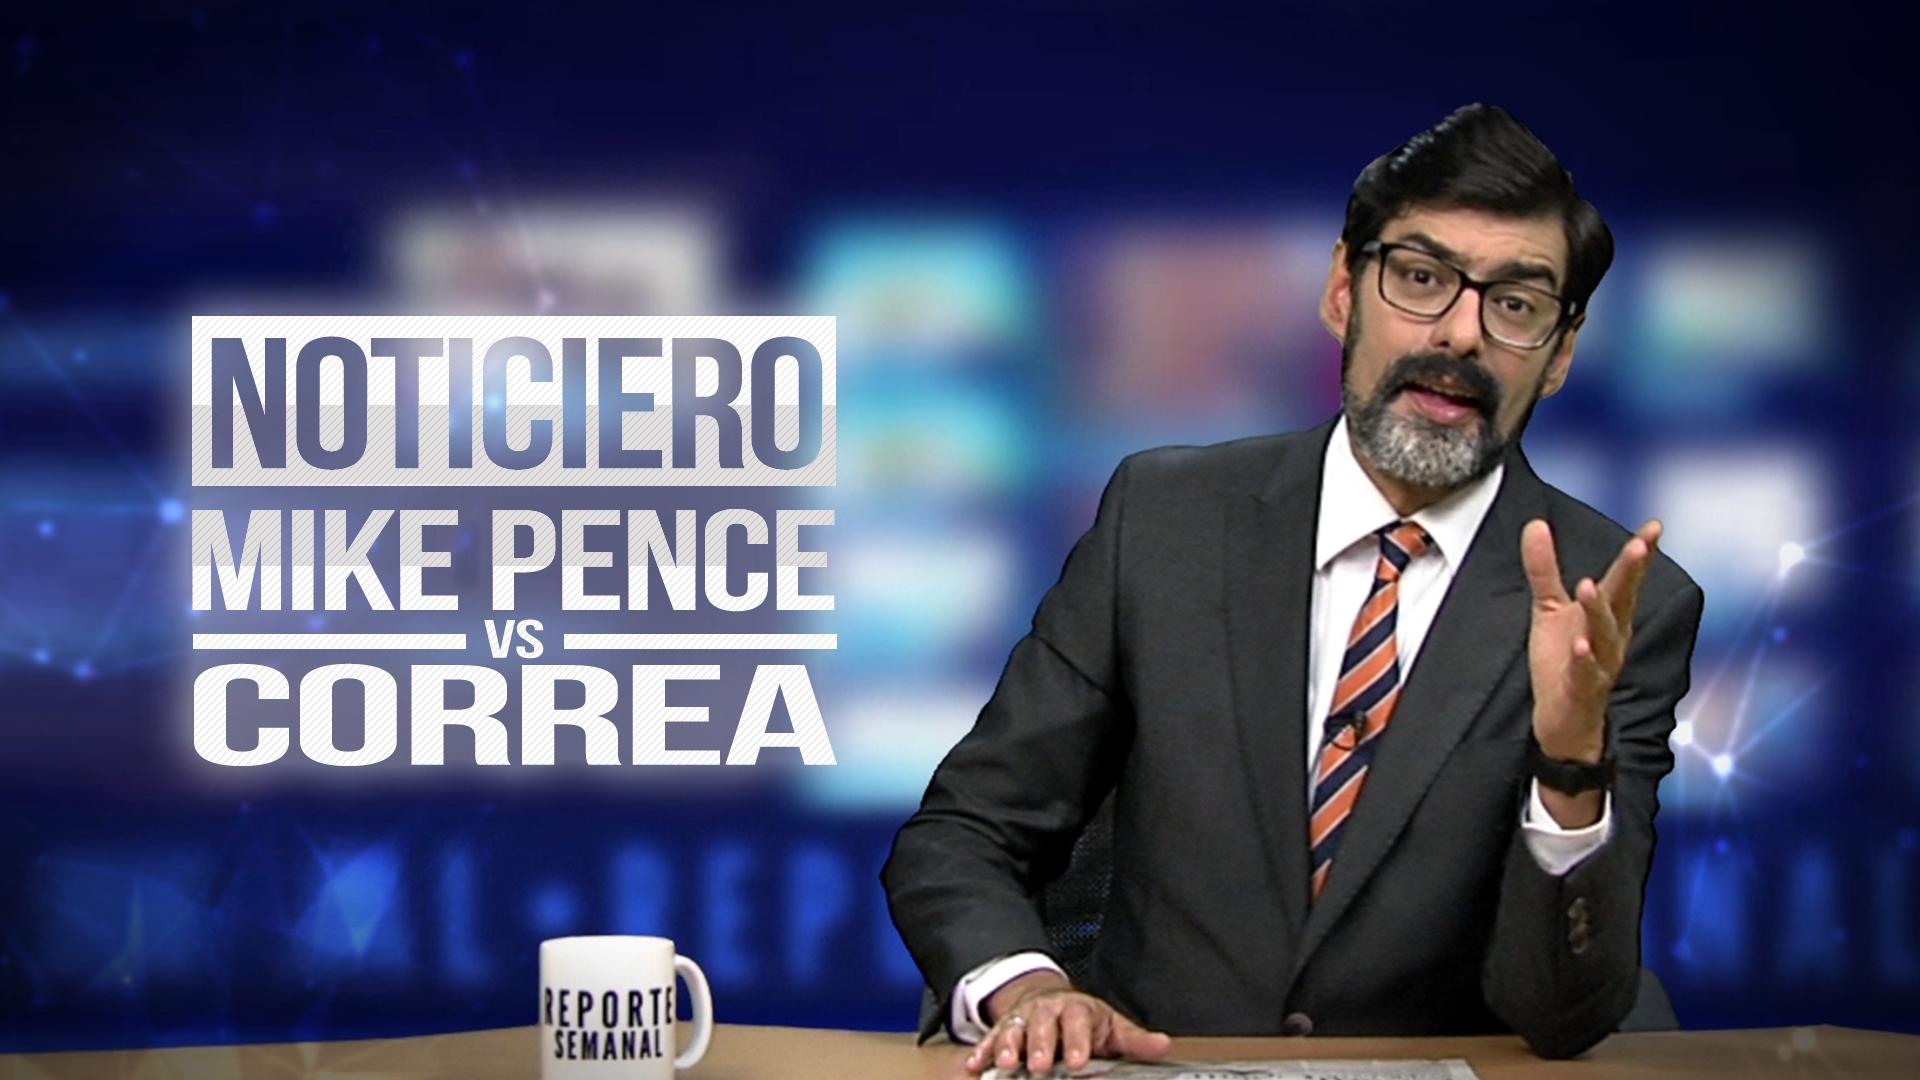 Reporte Semanal - Noticiero: Mike Pence Vs. Correa